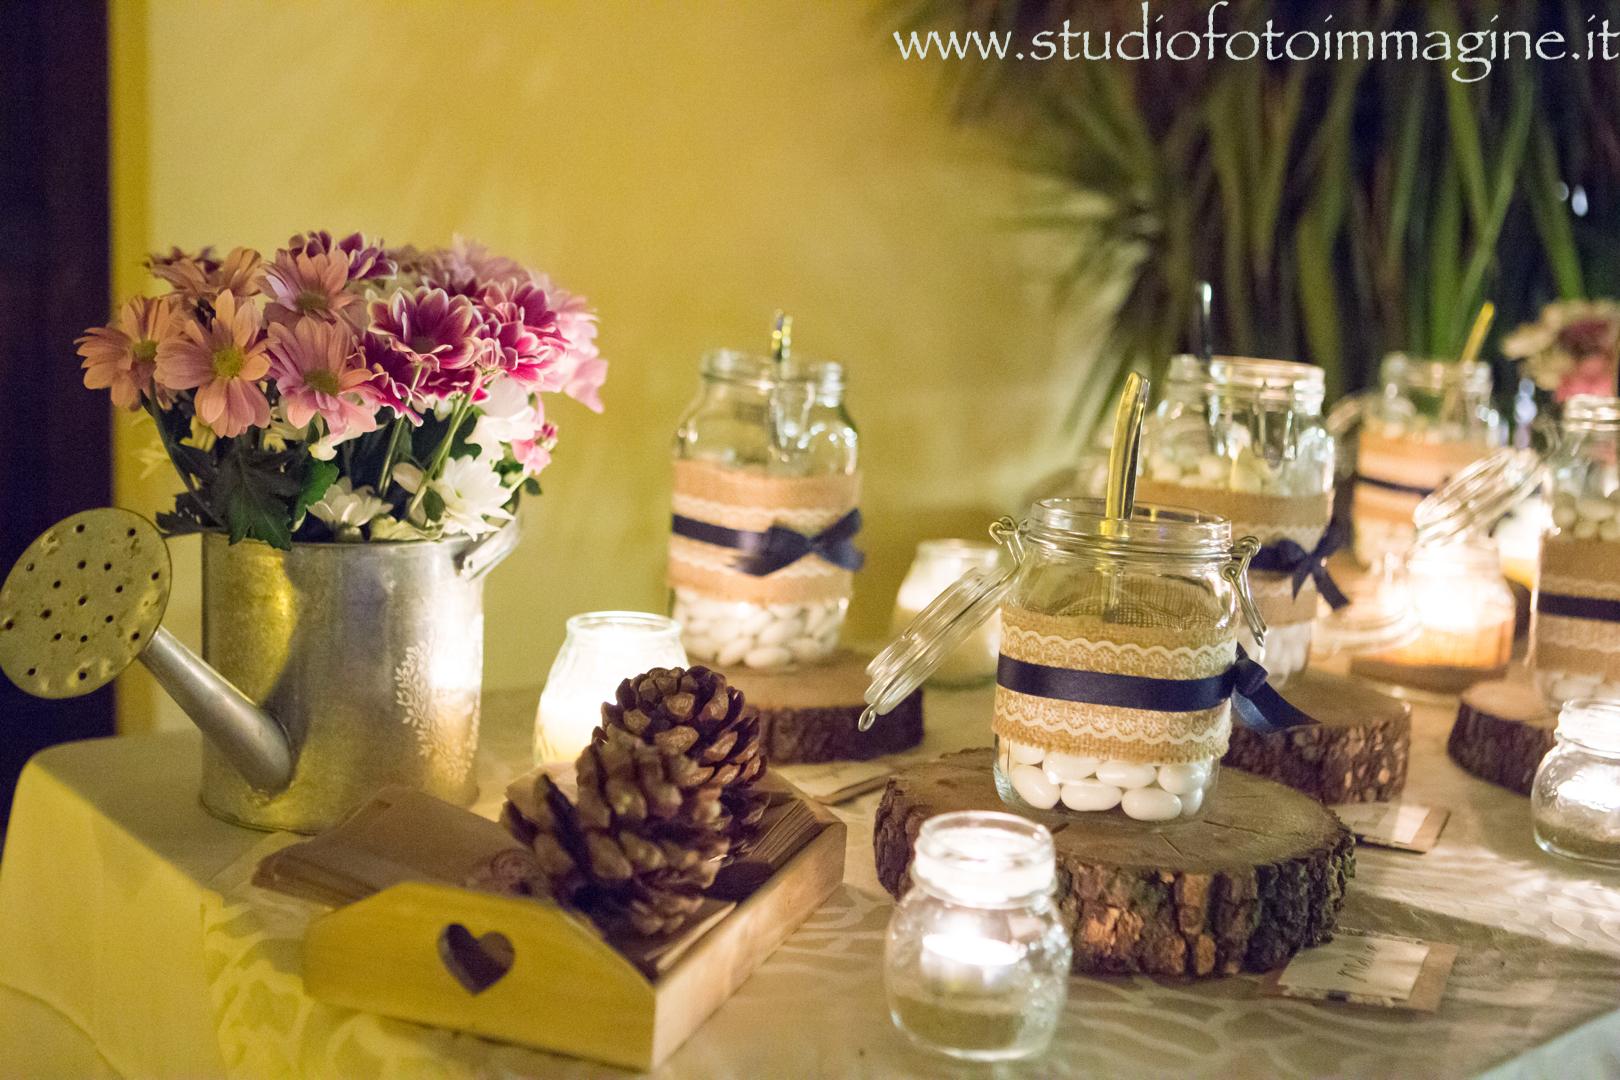 www.studiofotoimmagine.it